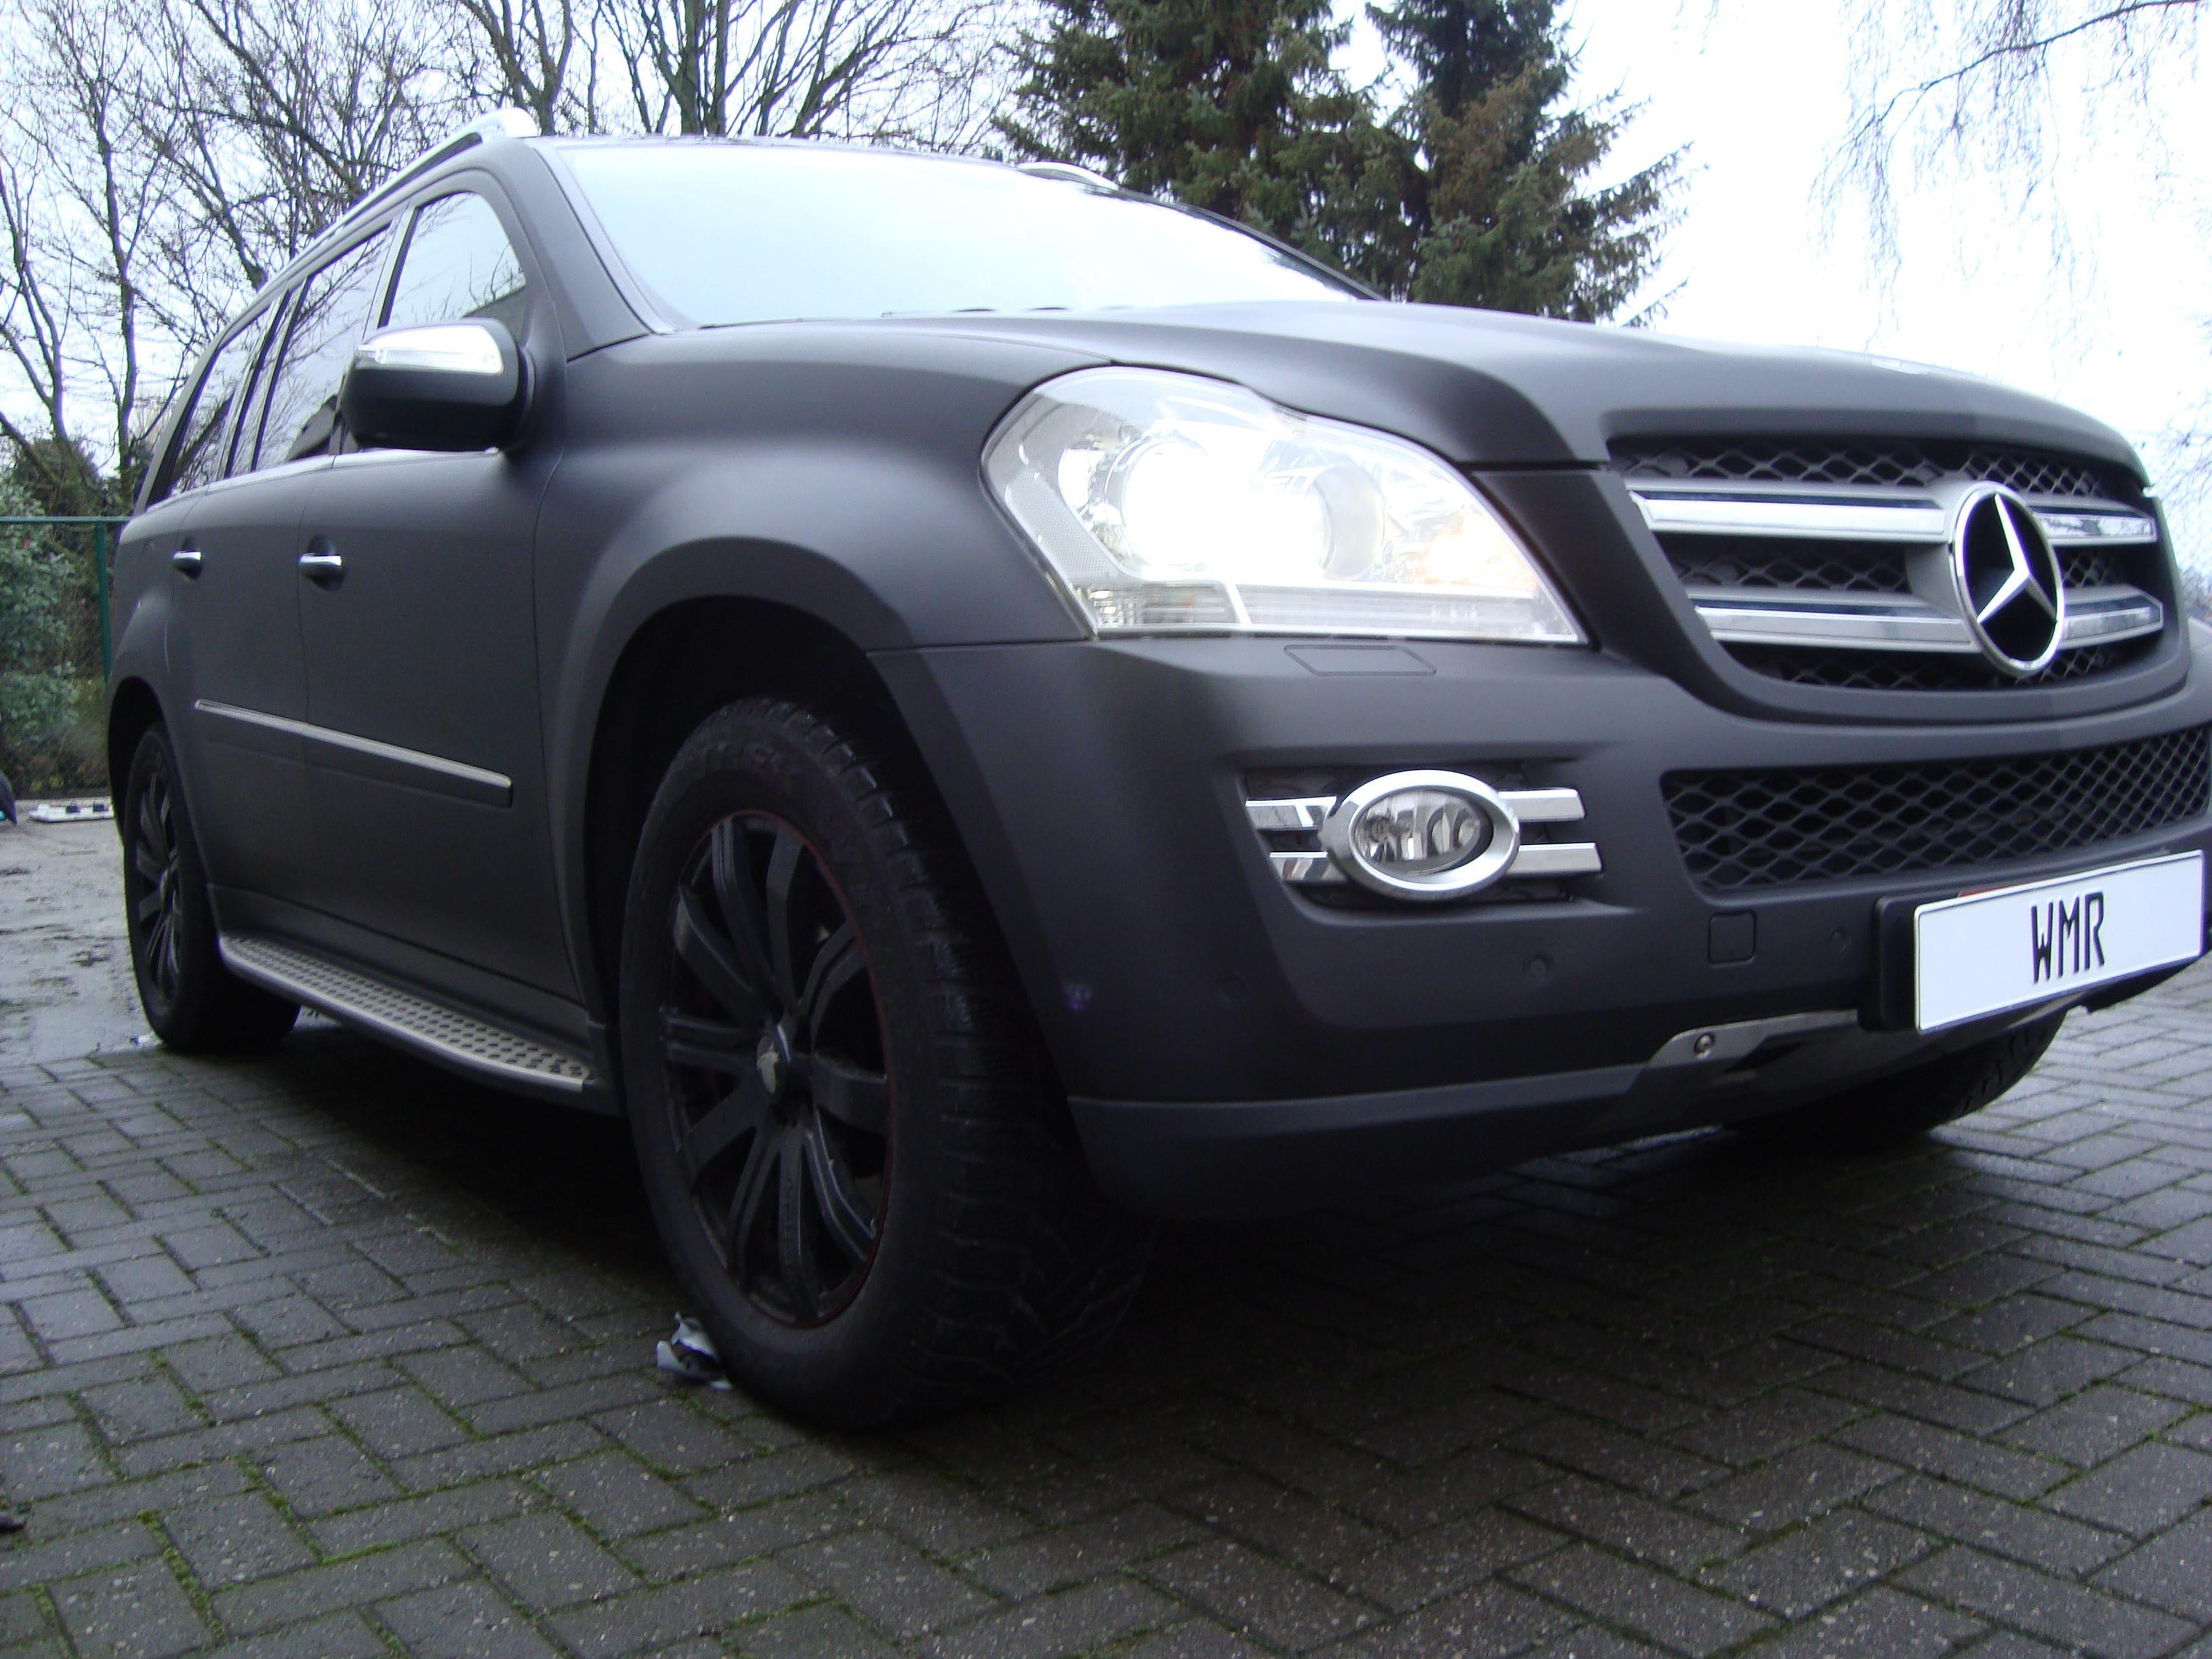 Mercedes GL met Mat Zwarte Wrap, Carwrapping door Wrapmyride.nu Foto-nr:6286, ©2020